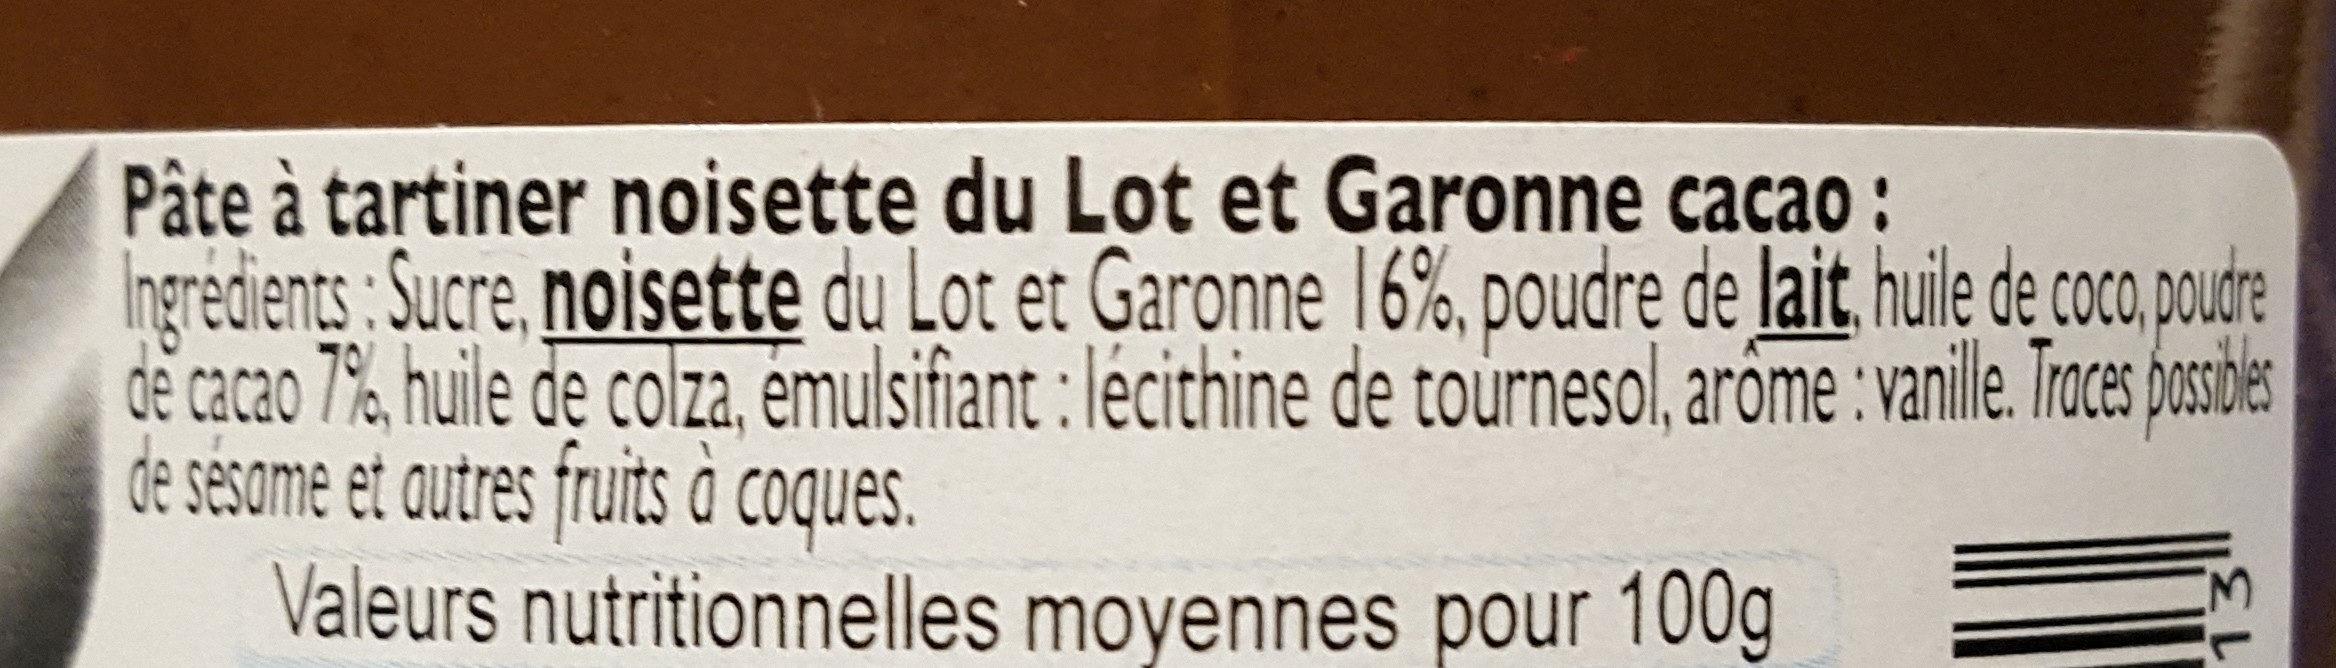 PATE A TARTINER NOISETTE LOT&GARONNE ET CACAO - Ingrédients - fr